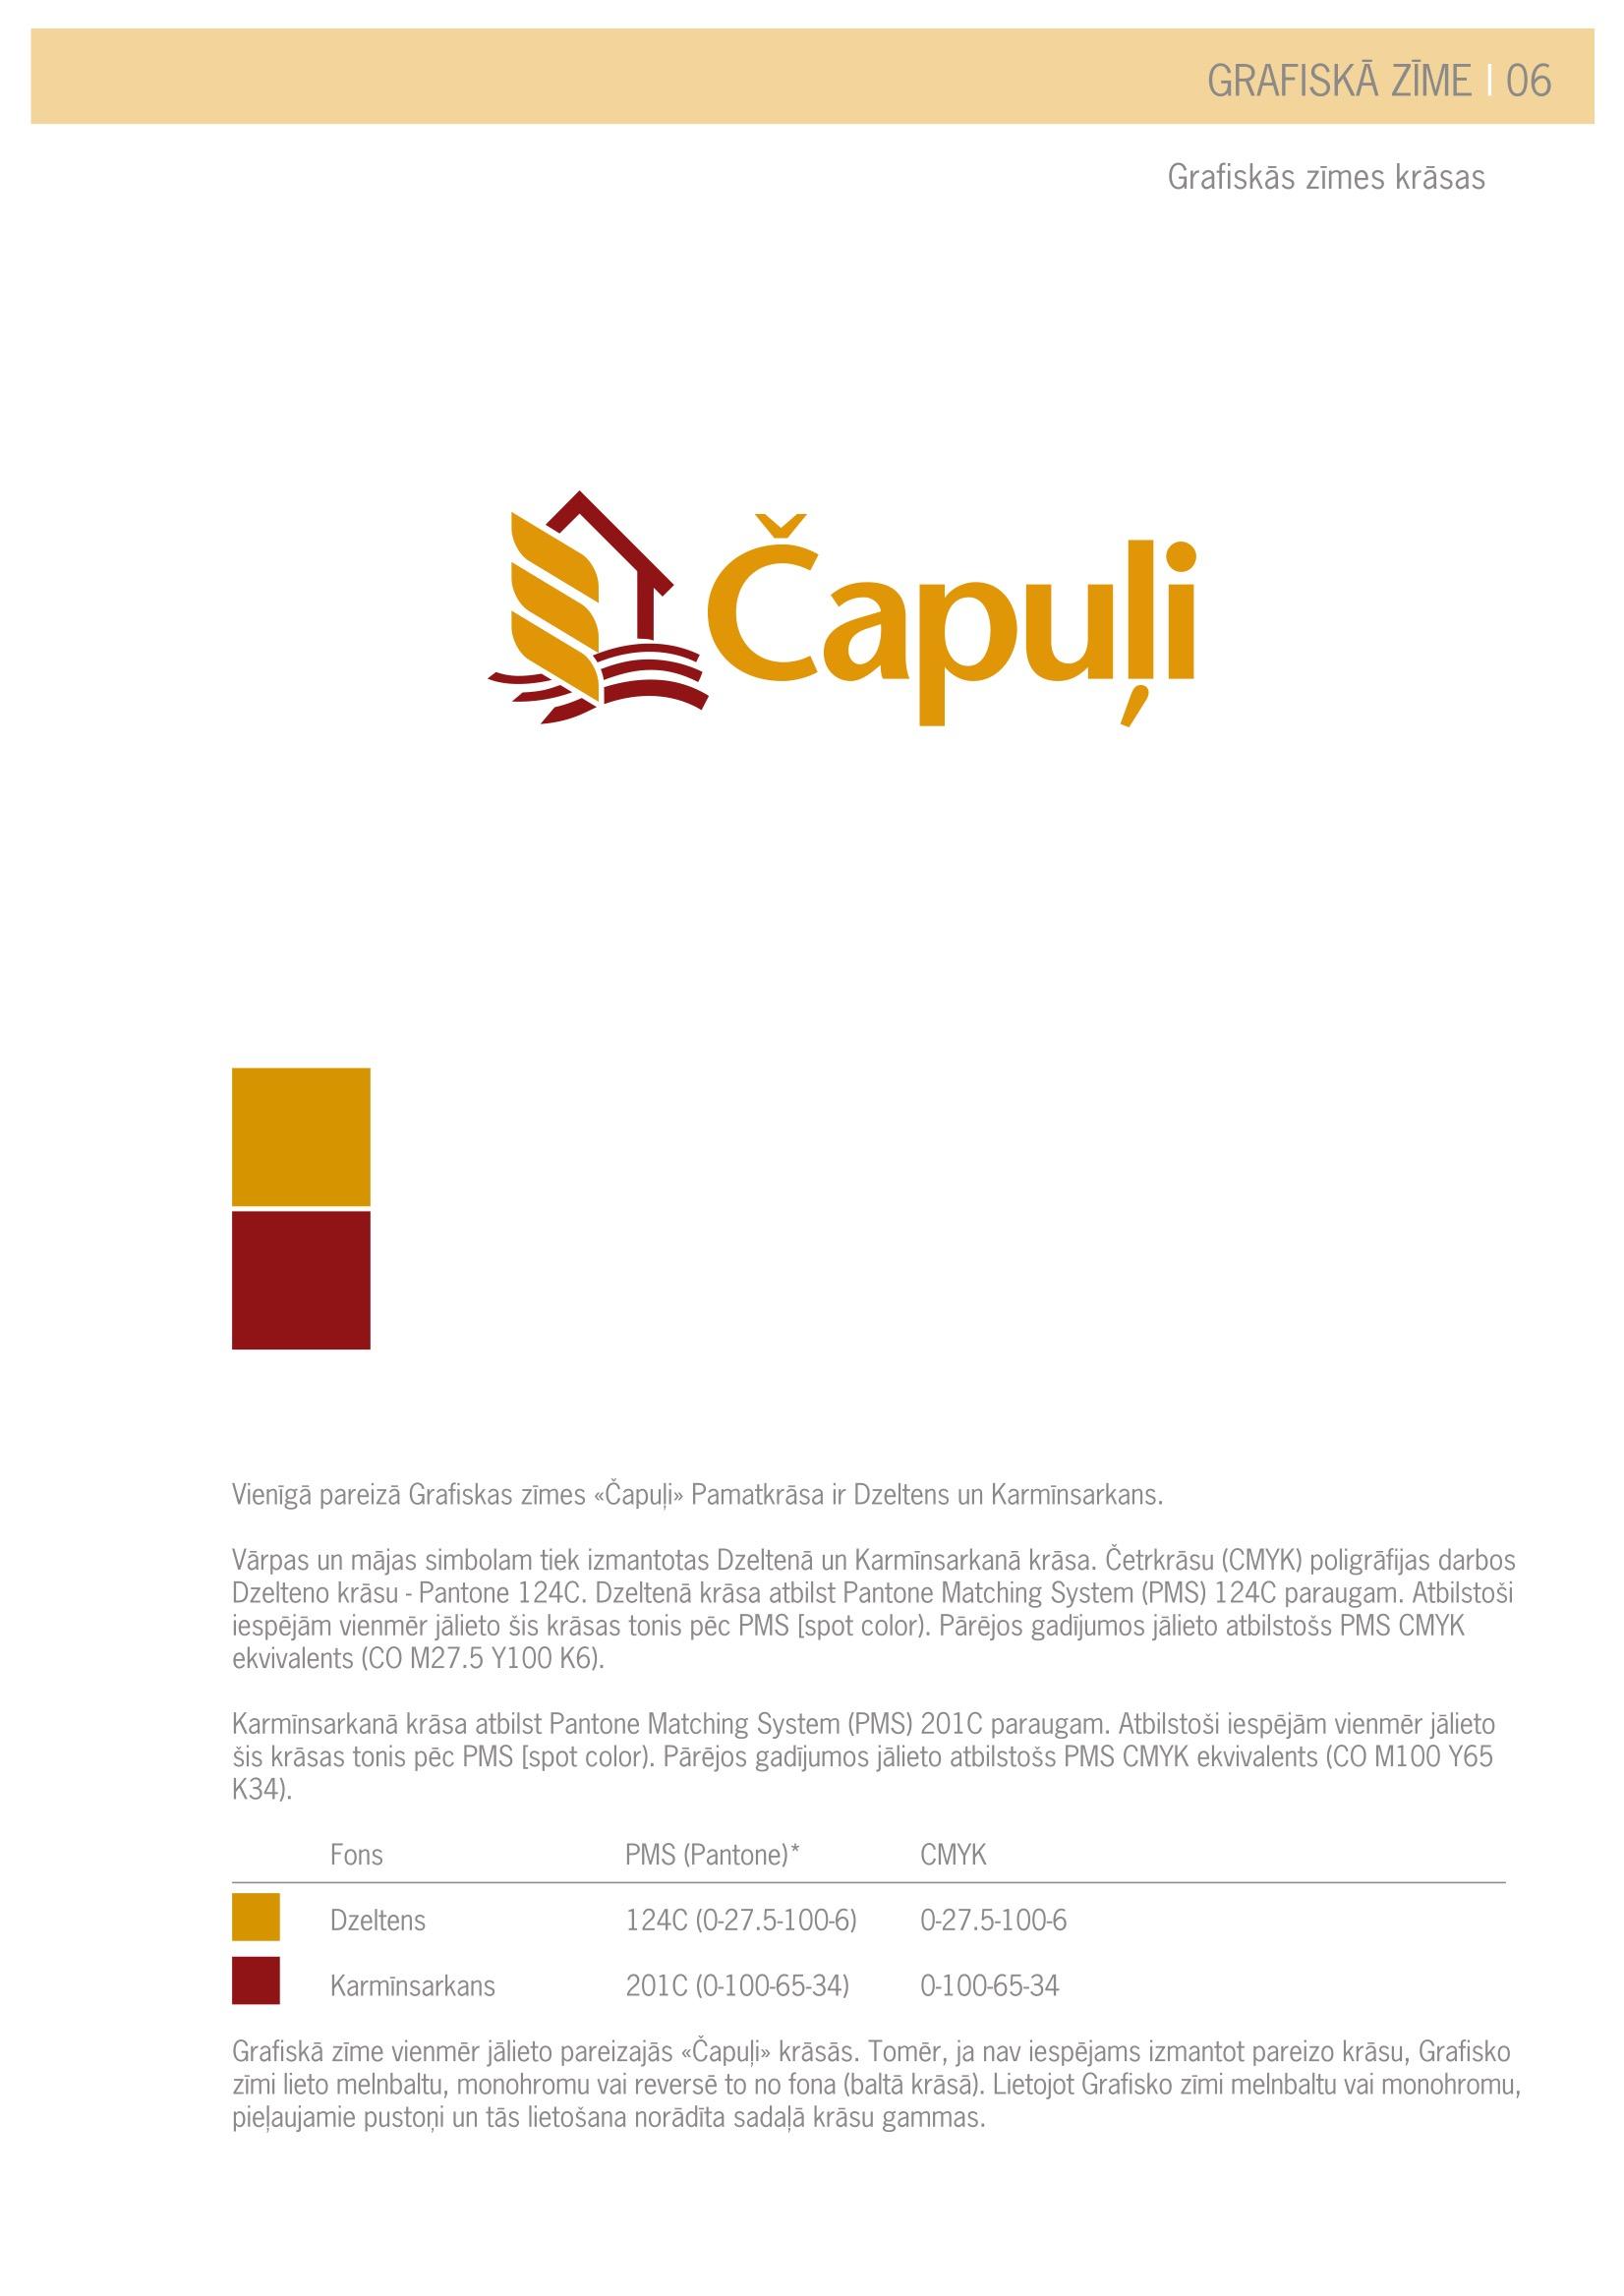 Chapulji_Stils 6